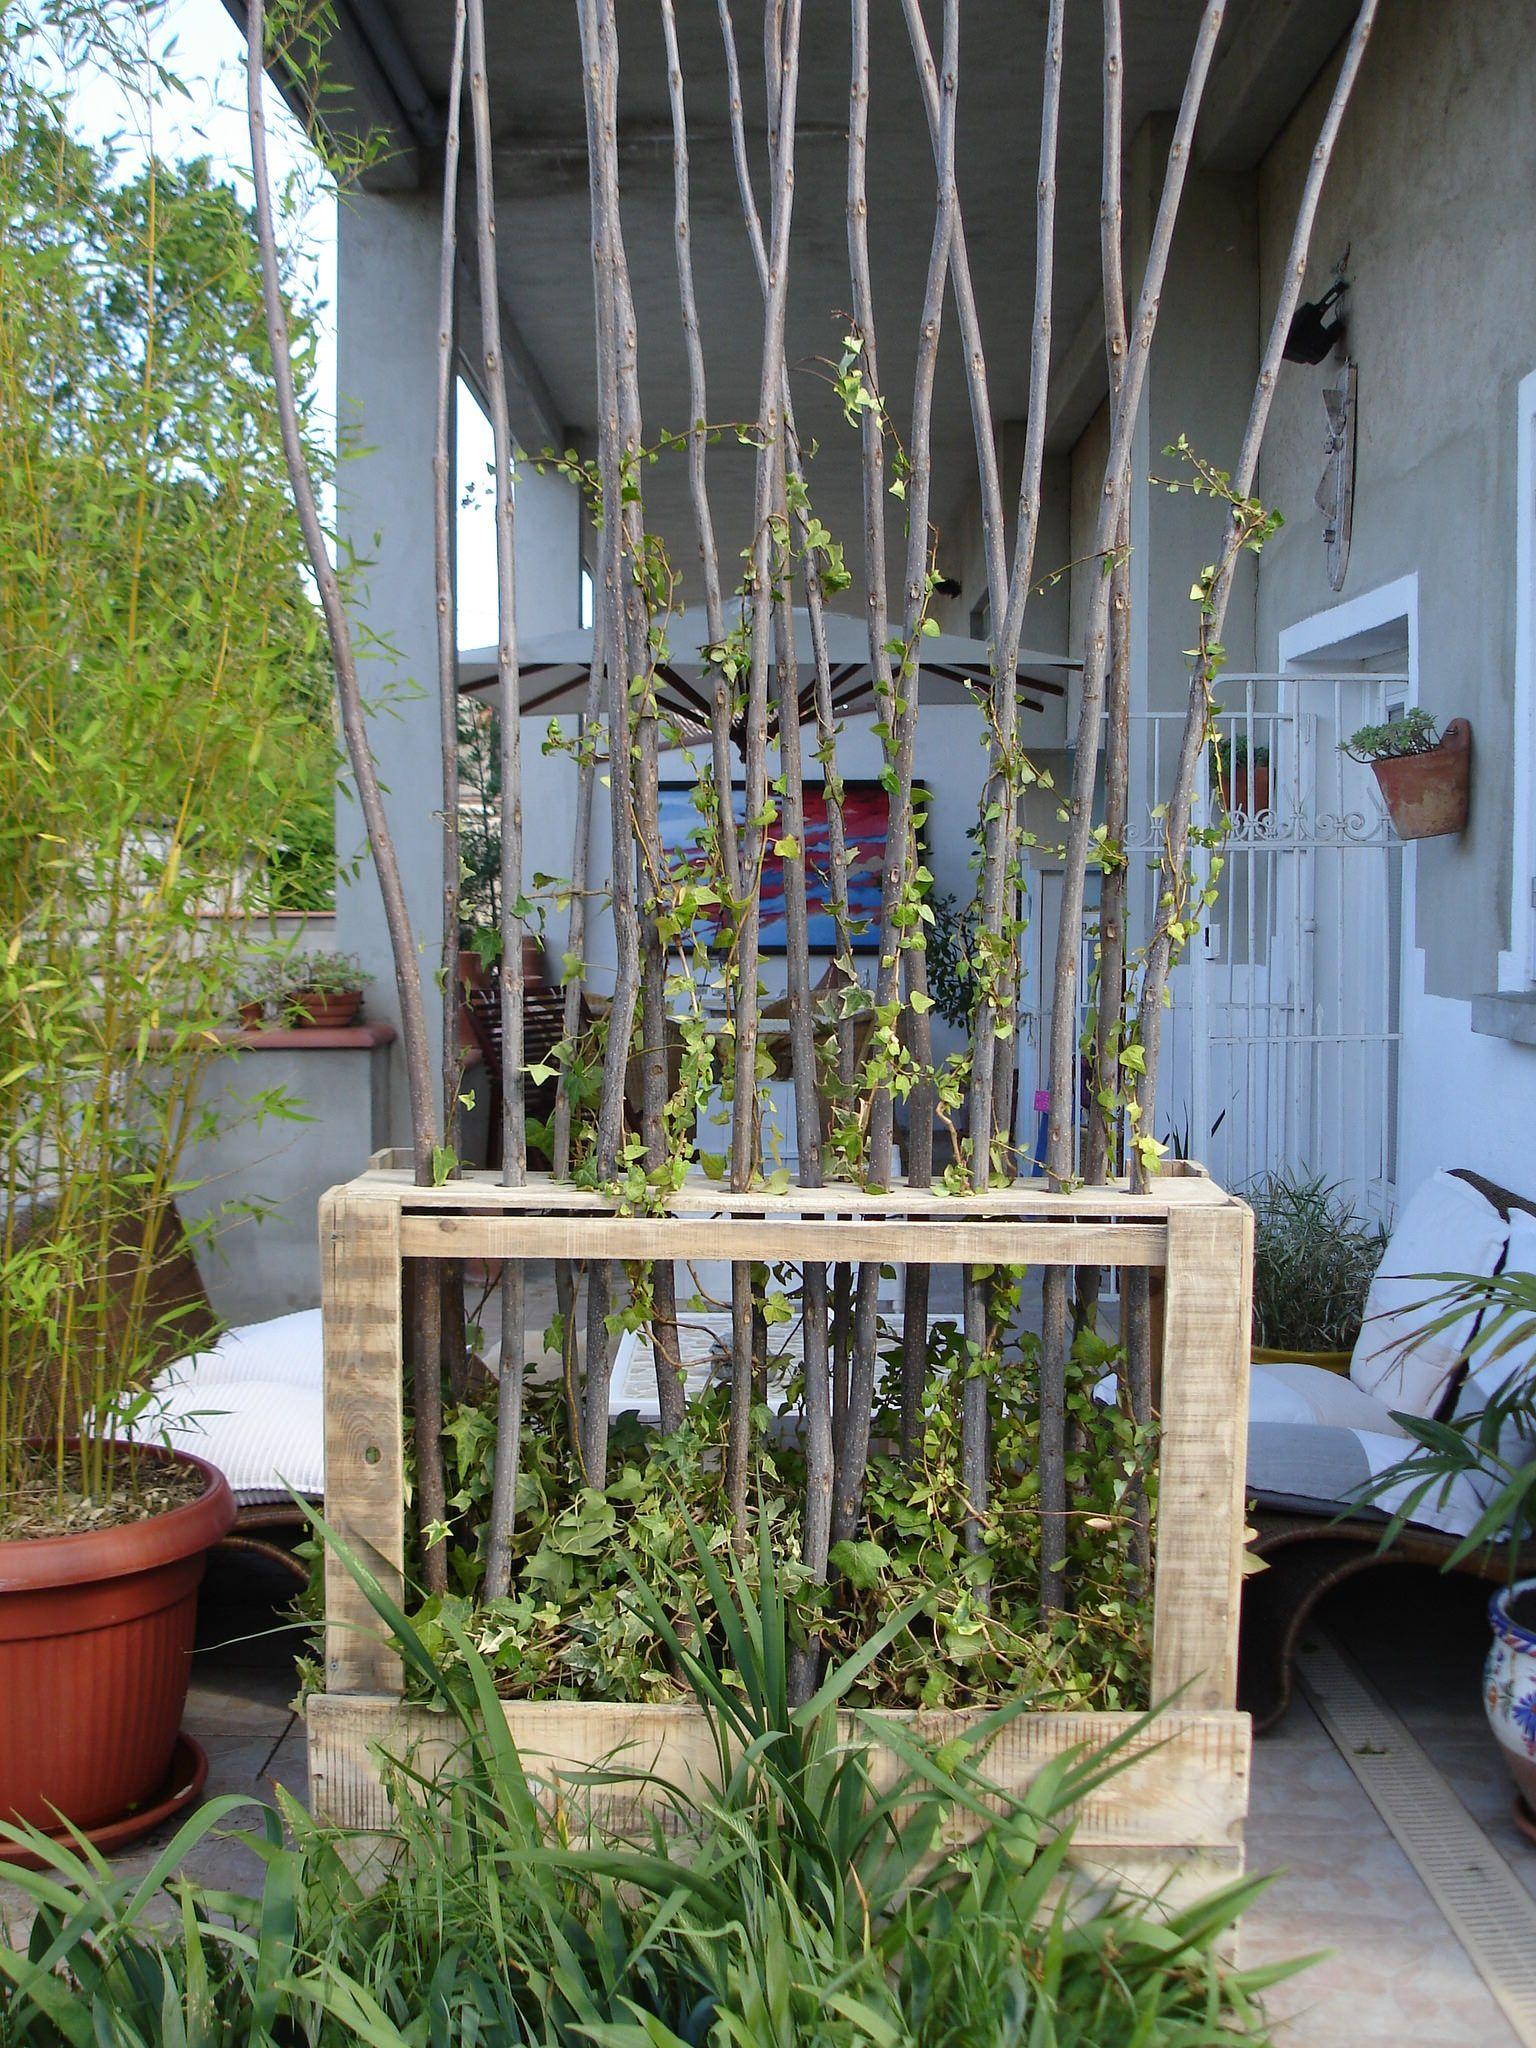 Upcycled Wooden Pallet Vegetal Fence | Jardin | Palette Bois ... tout Paravent De Jardin